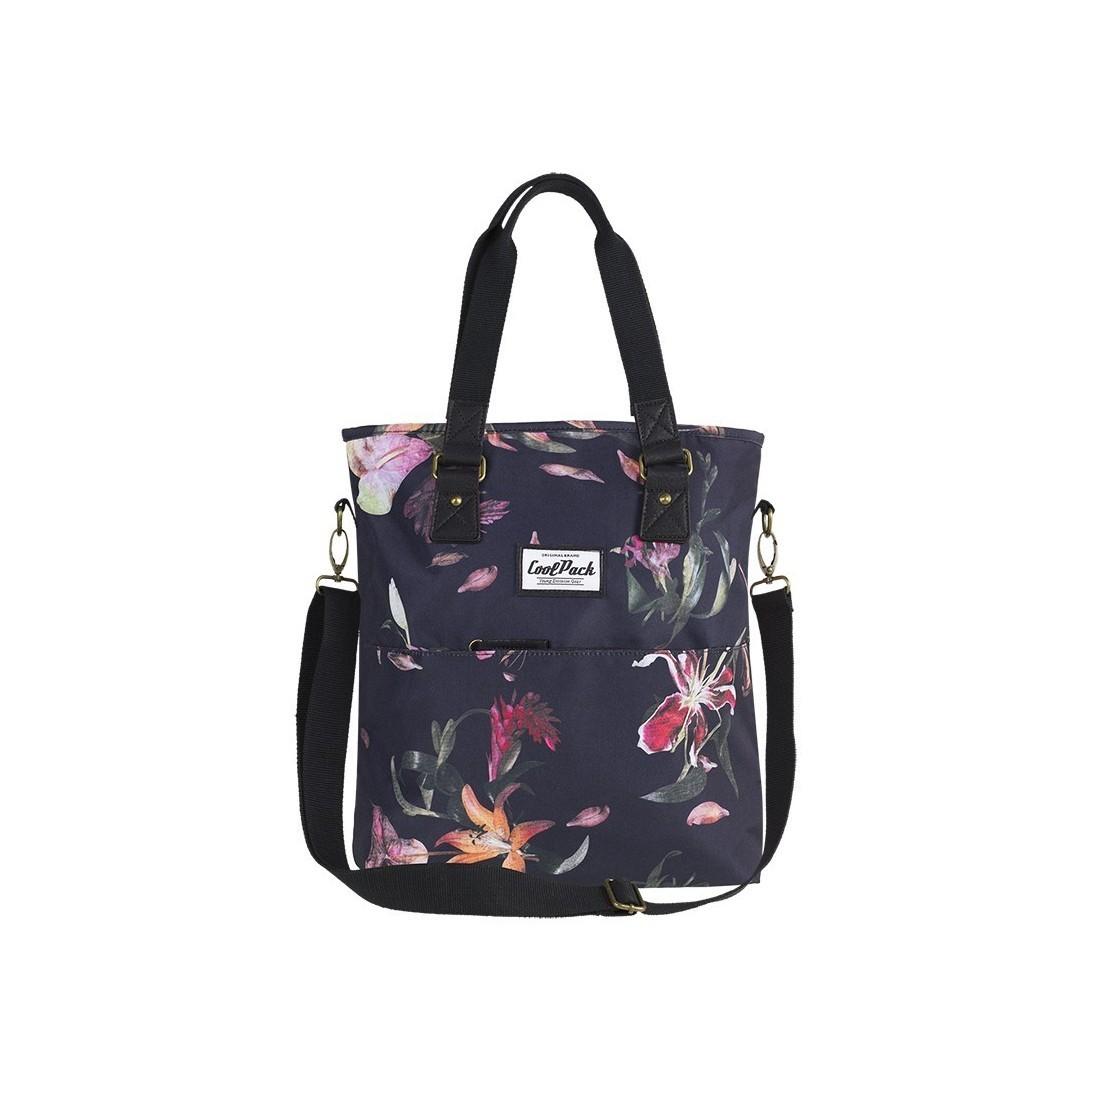 864b669b52945 Czarna torba damska na ramię CoolPack CP AMBER LILIES lilie kwiaty - A098